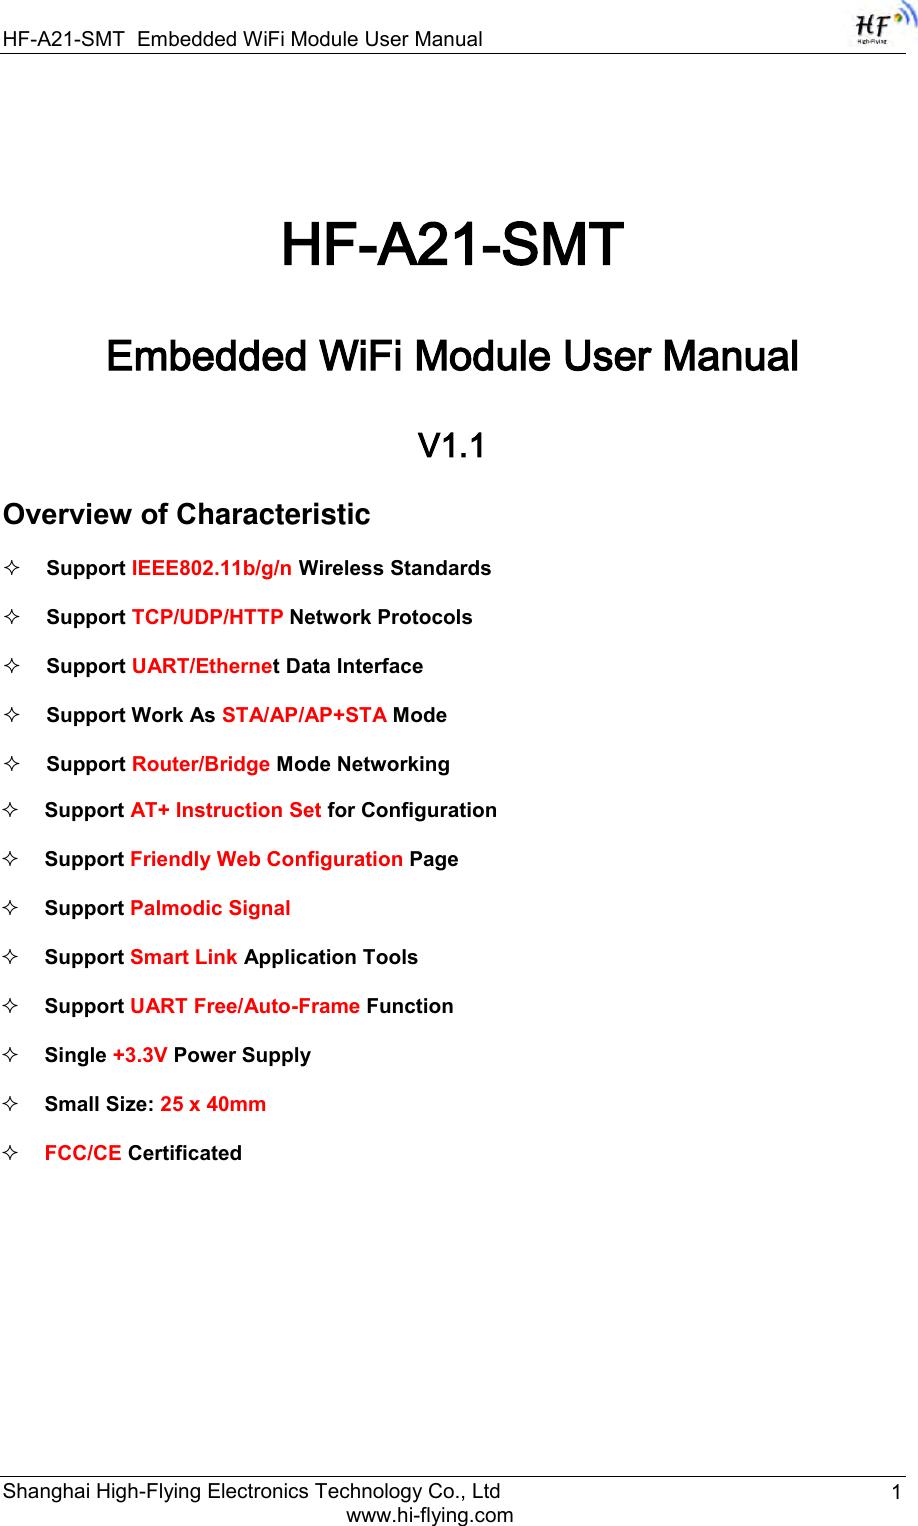 High Flying Electronics Technology HF-A21-SMT Embedded Wi-Fi